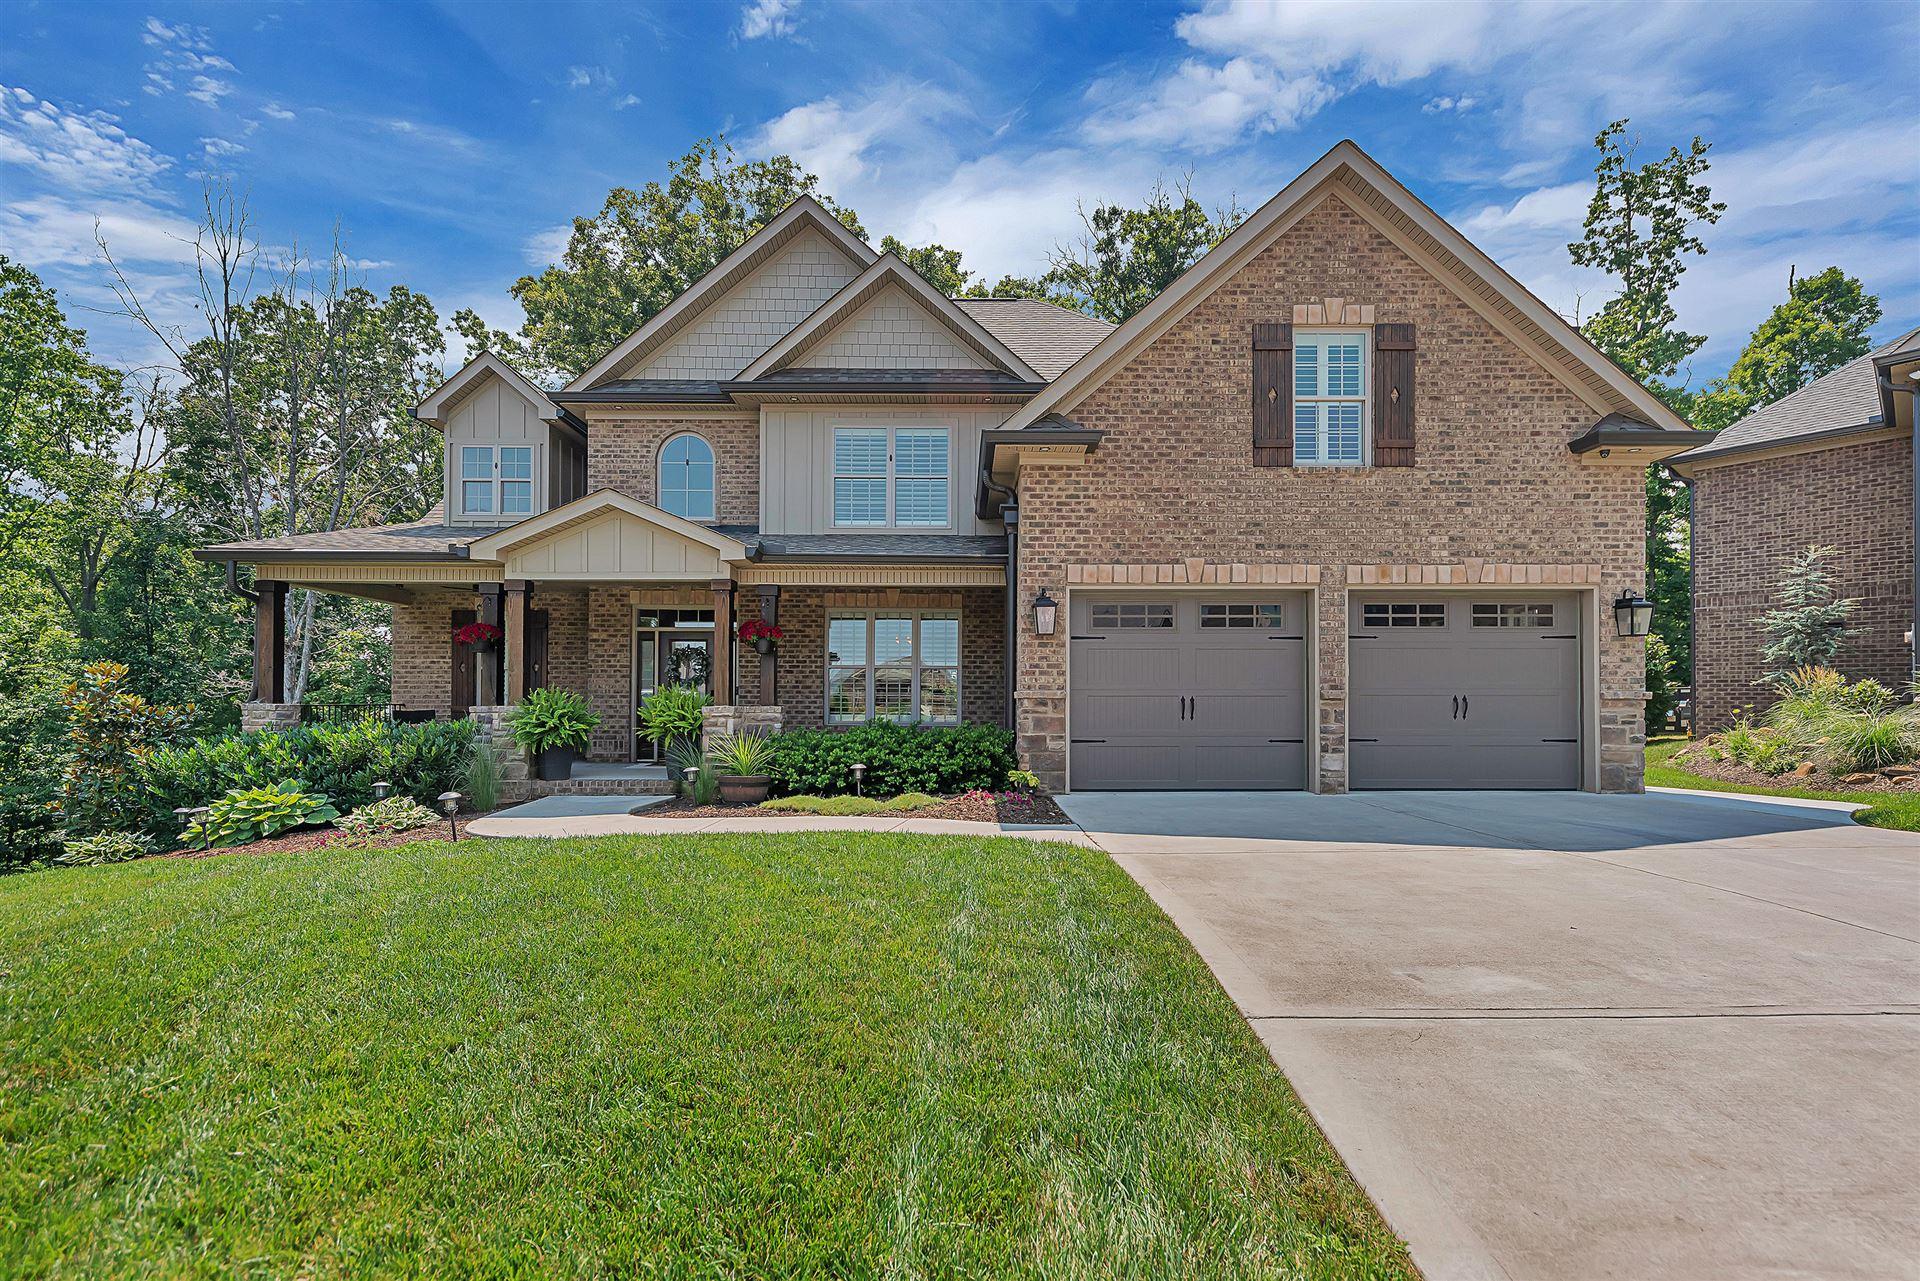 10318 Avery Springs Lane, Knoxville, TN 37922 - MLS#: 1162186